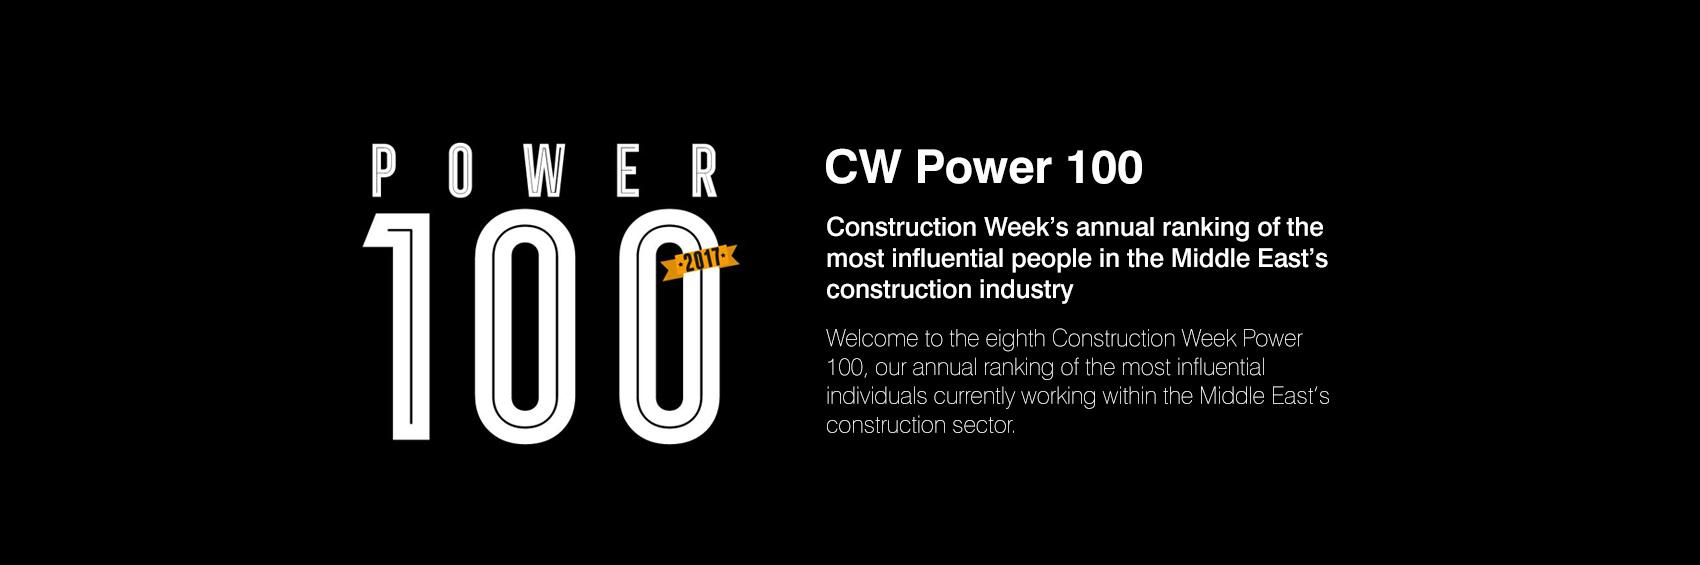 2017 POWER 100